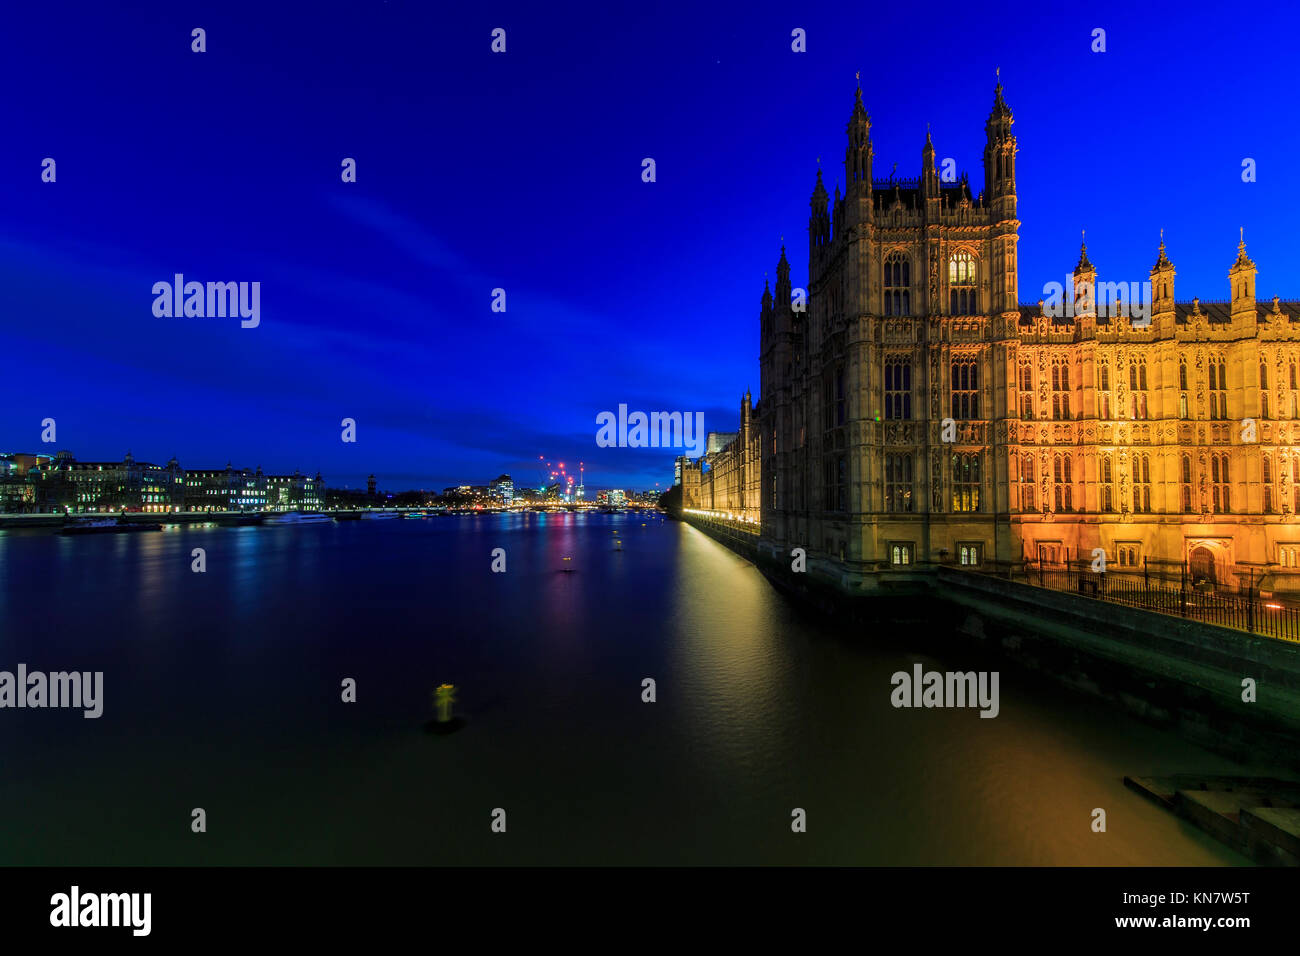 London, NOV 13: Night view of the famous Big Ben on NOV 13, 2015 at London, United Kingdom Stock Photo